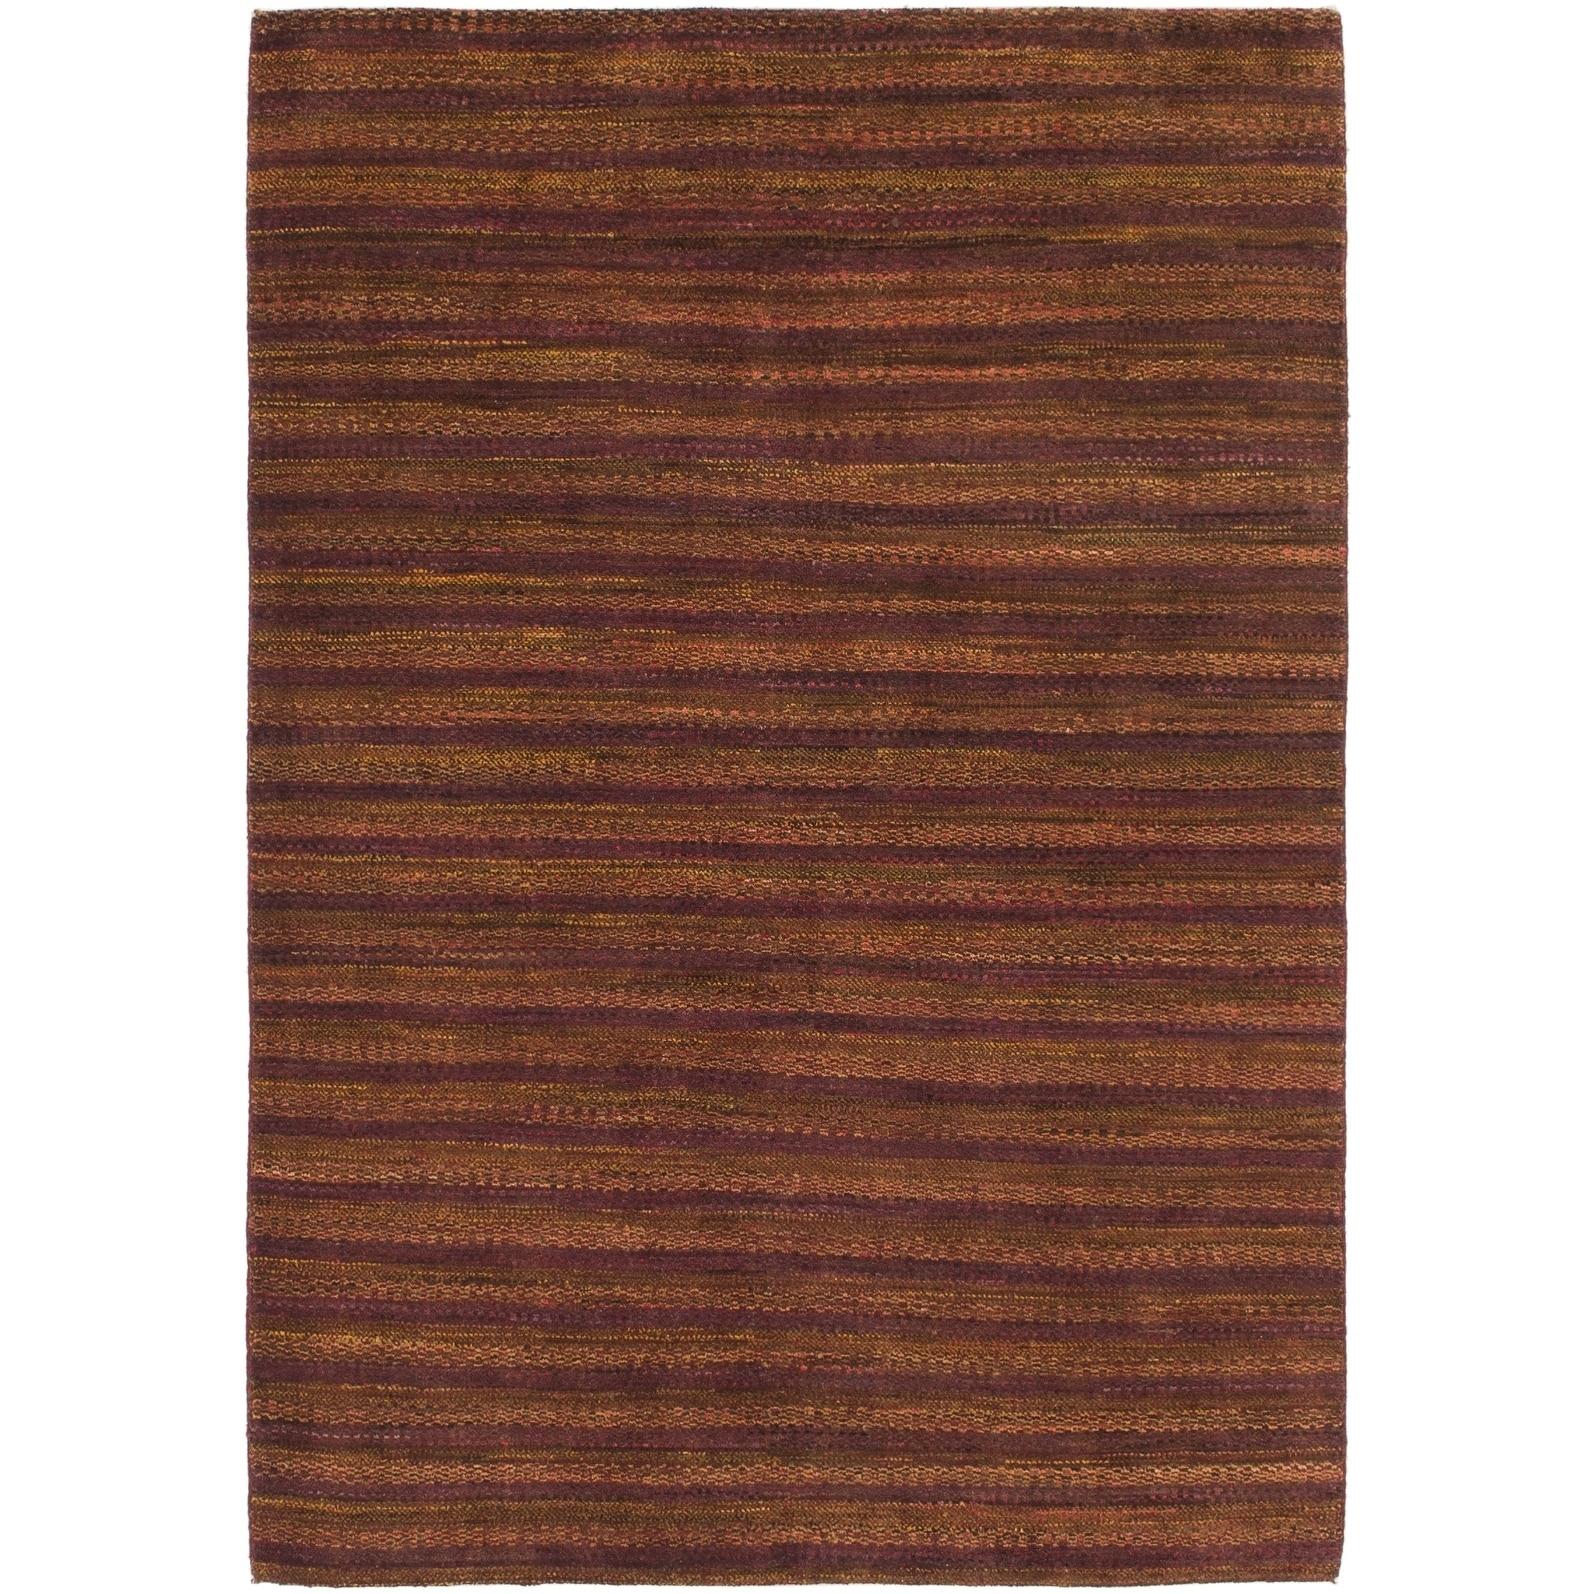 Hand Knotted Kashkuli Gabbeh Wool Area Rug - 4 7 x 6 8 (Burgundy - 4 7 x 6 8)